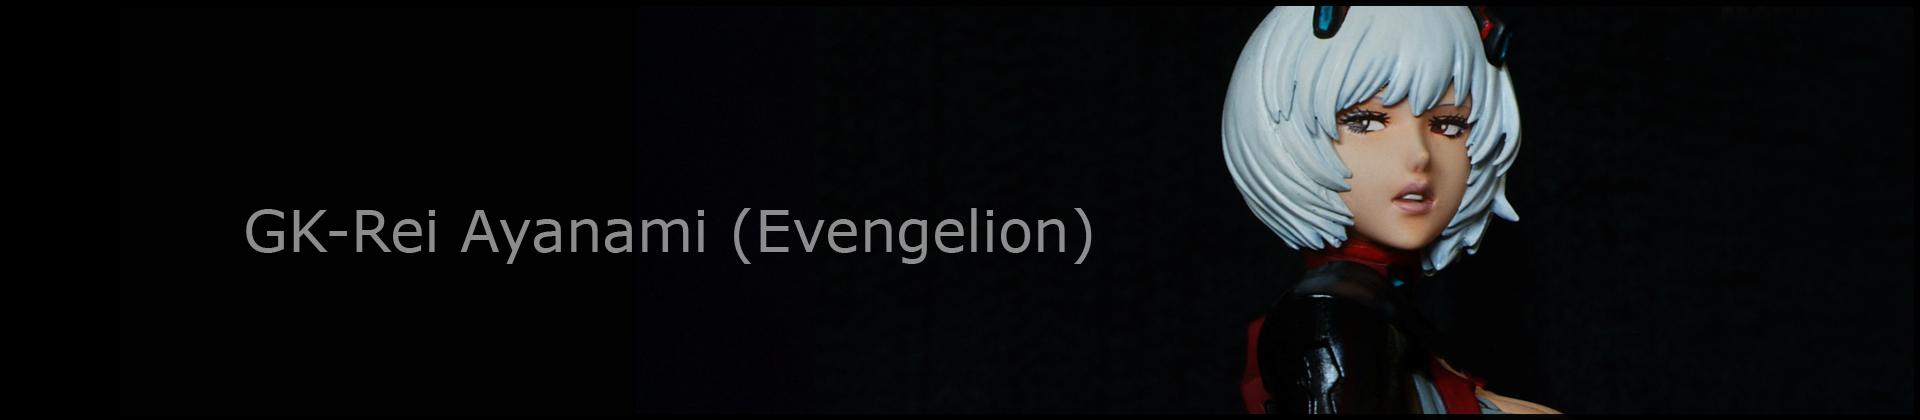 GK-Rei Ayanami (Evengelion)